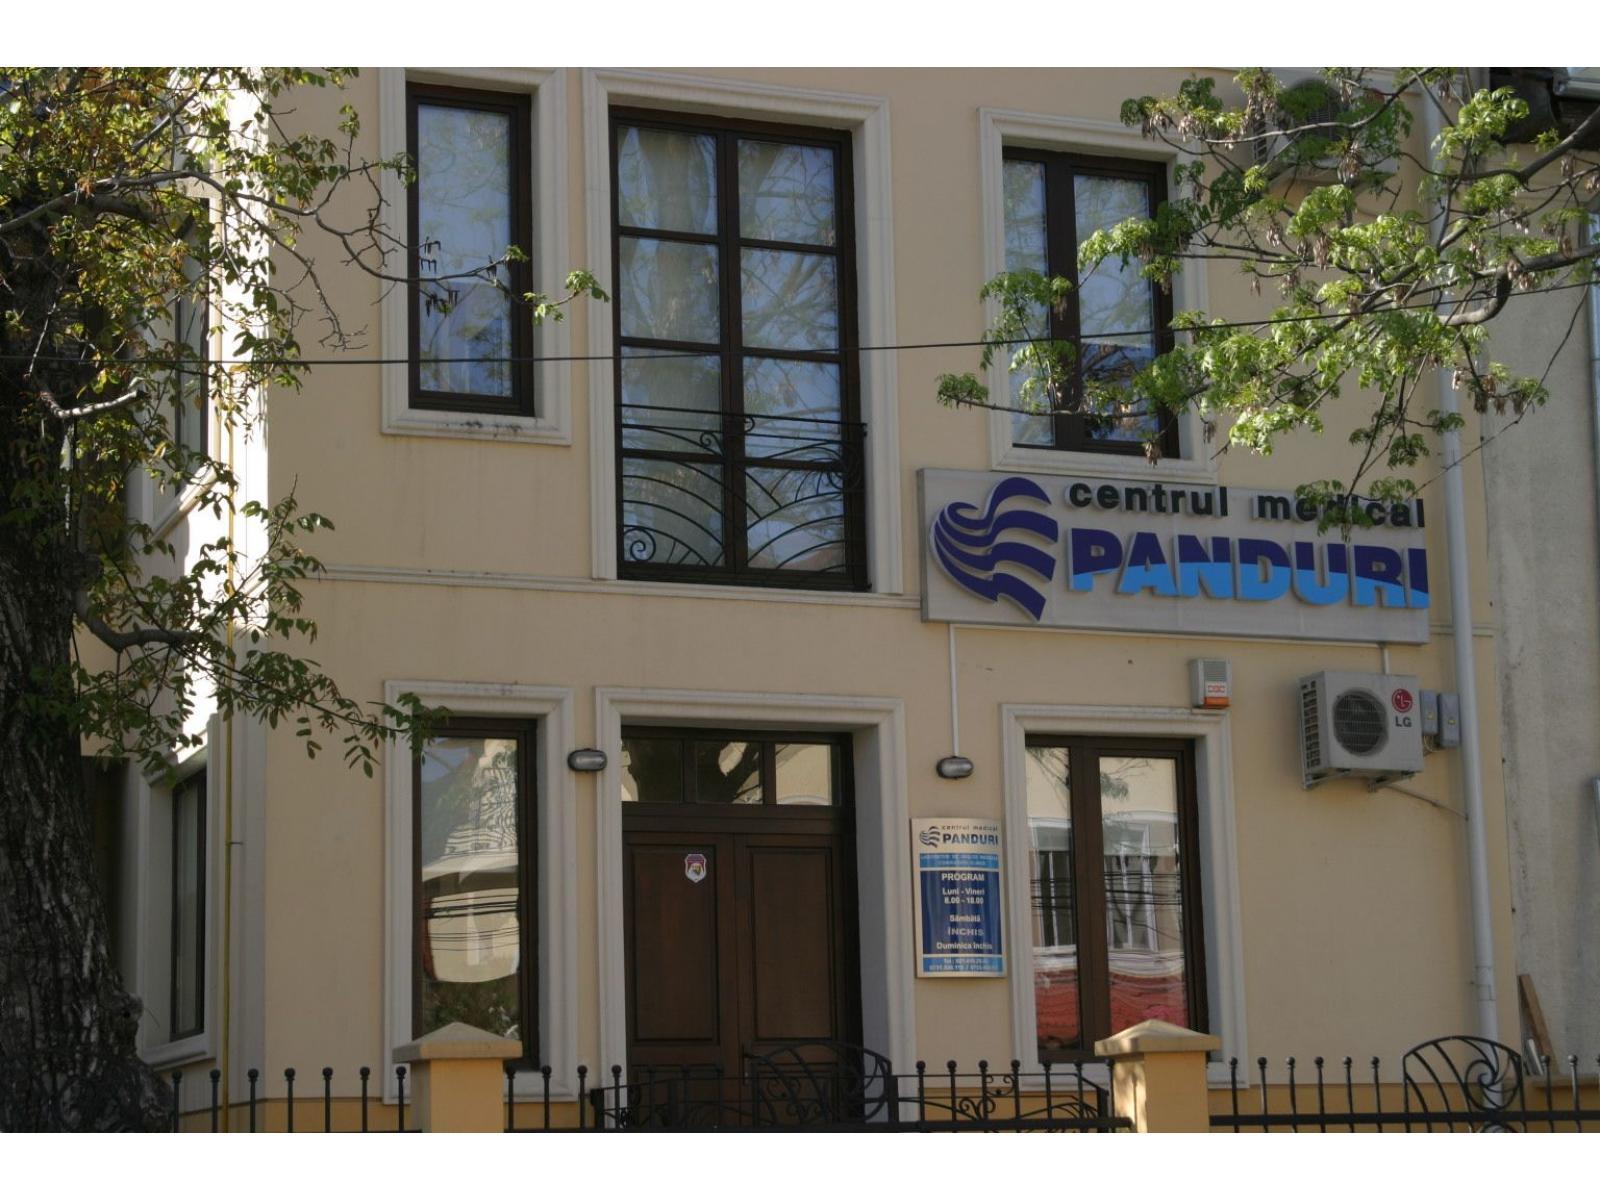 Centrul Medical Panduri - IMG_6936.JPG